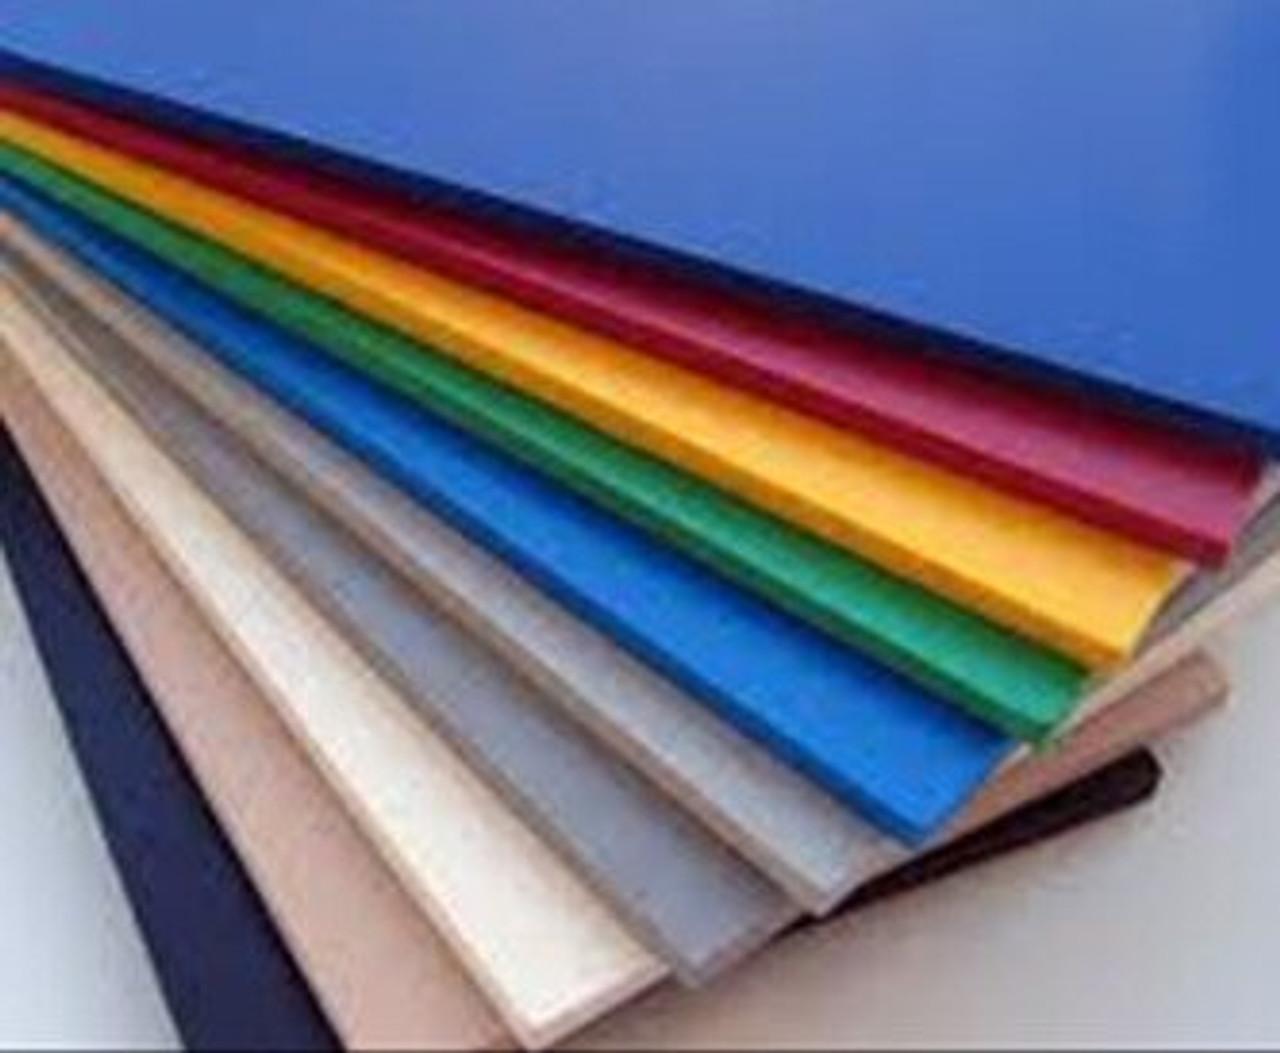 Sintra Board Blue - 4' x 8' x 3mil (122cm x 244cm)